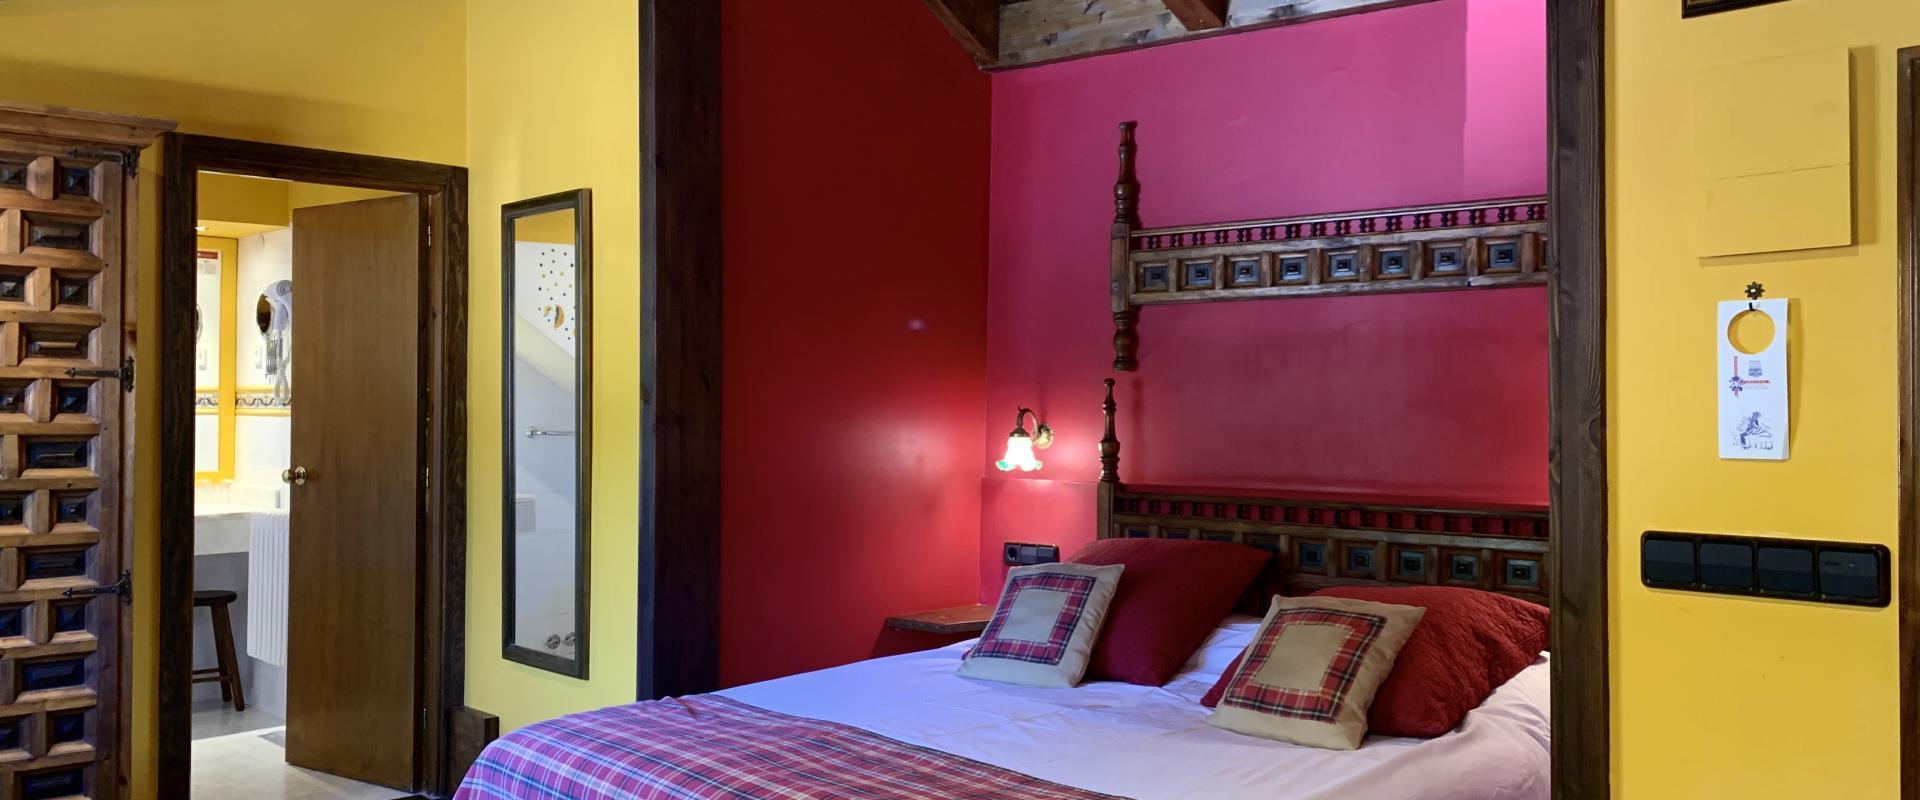 Double bedroom Hotel Aran la Abuela Vielha